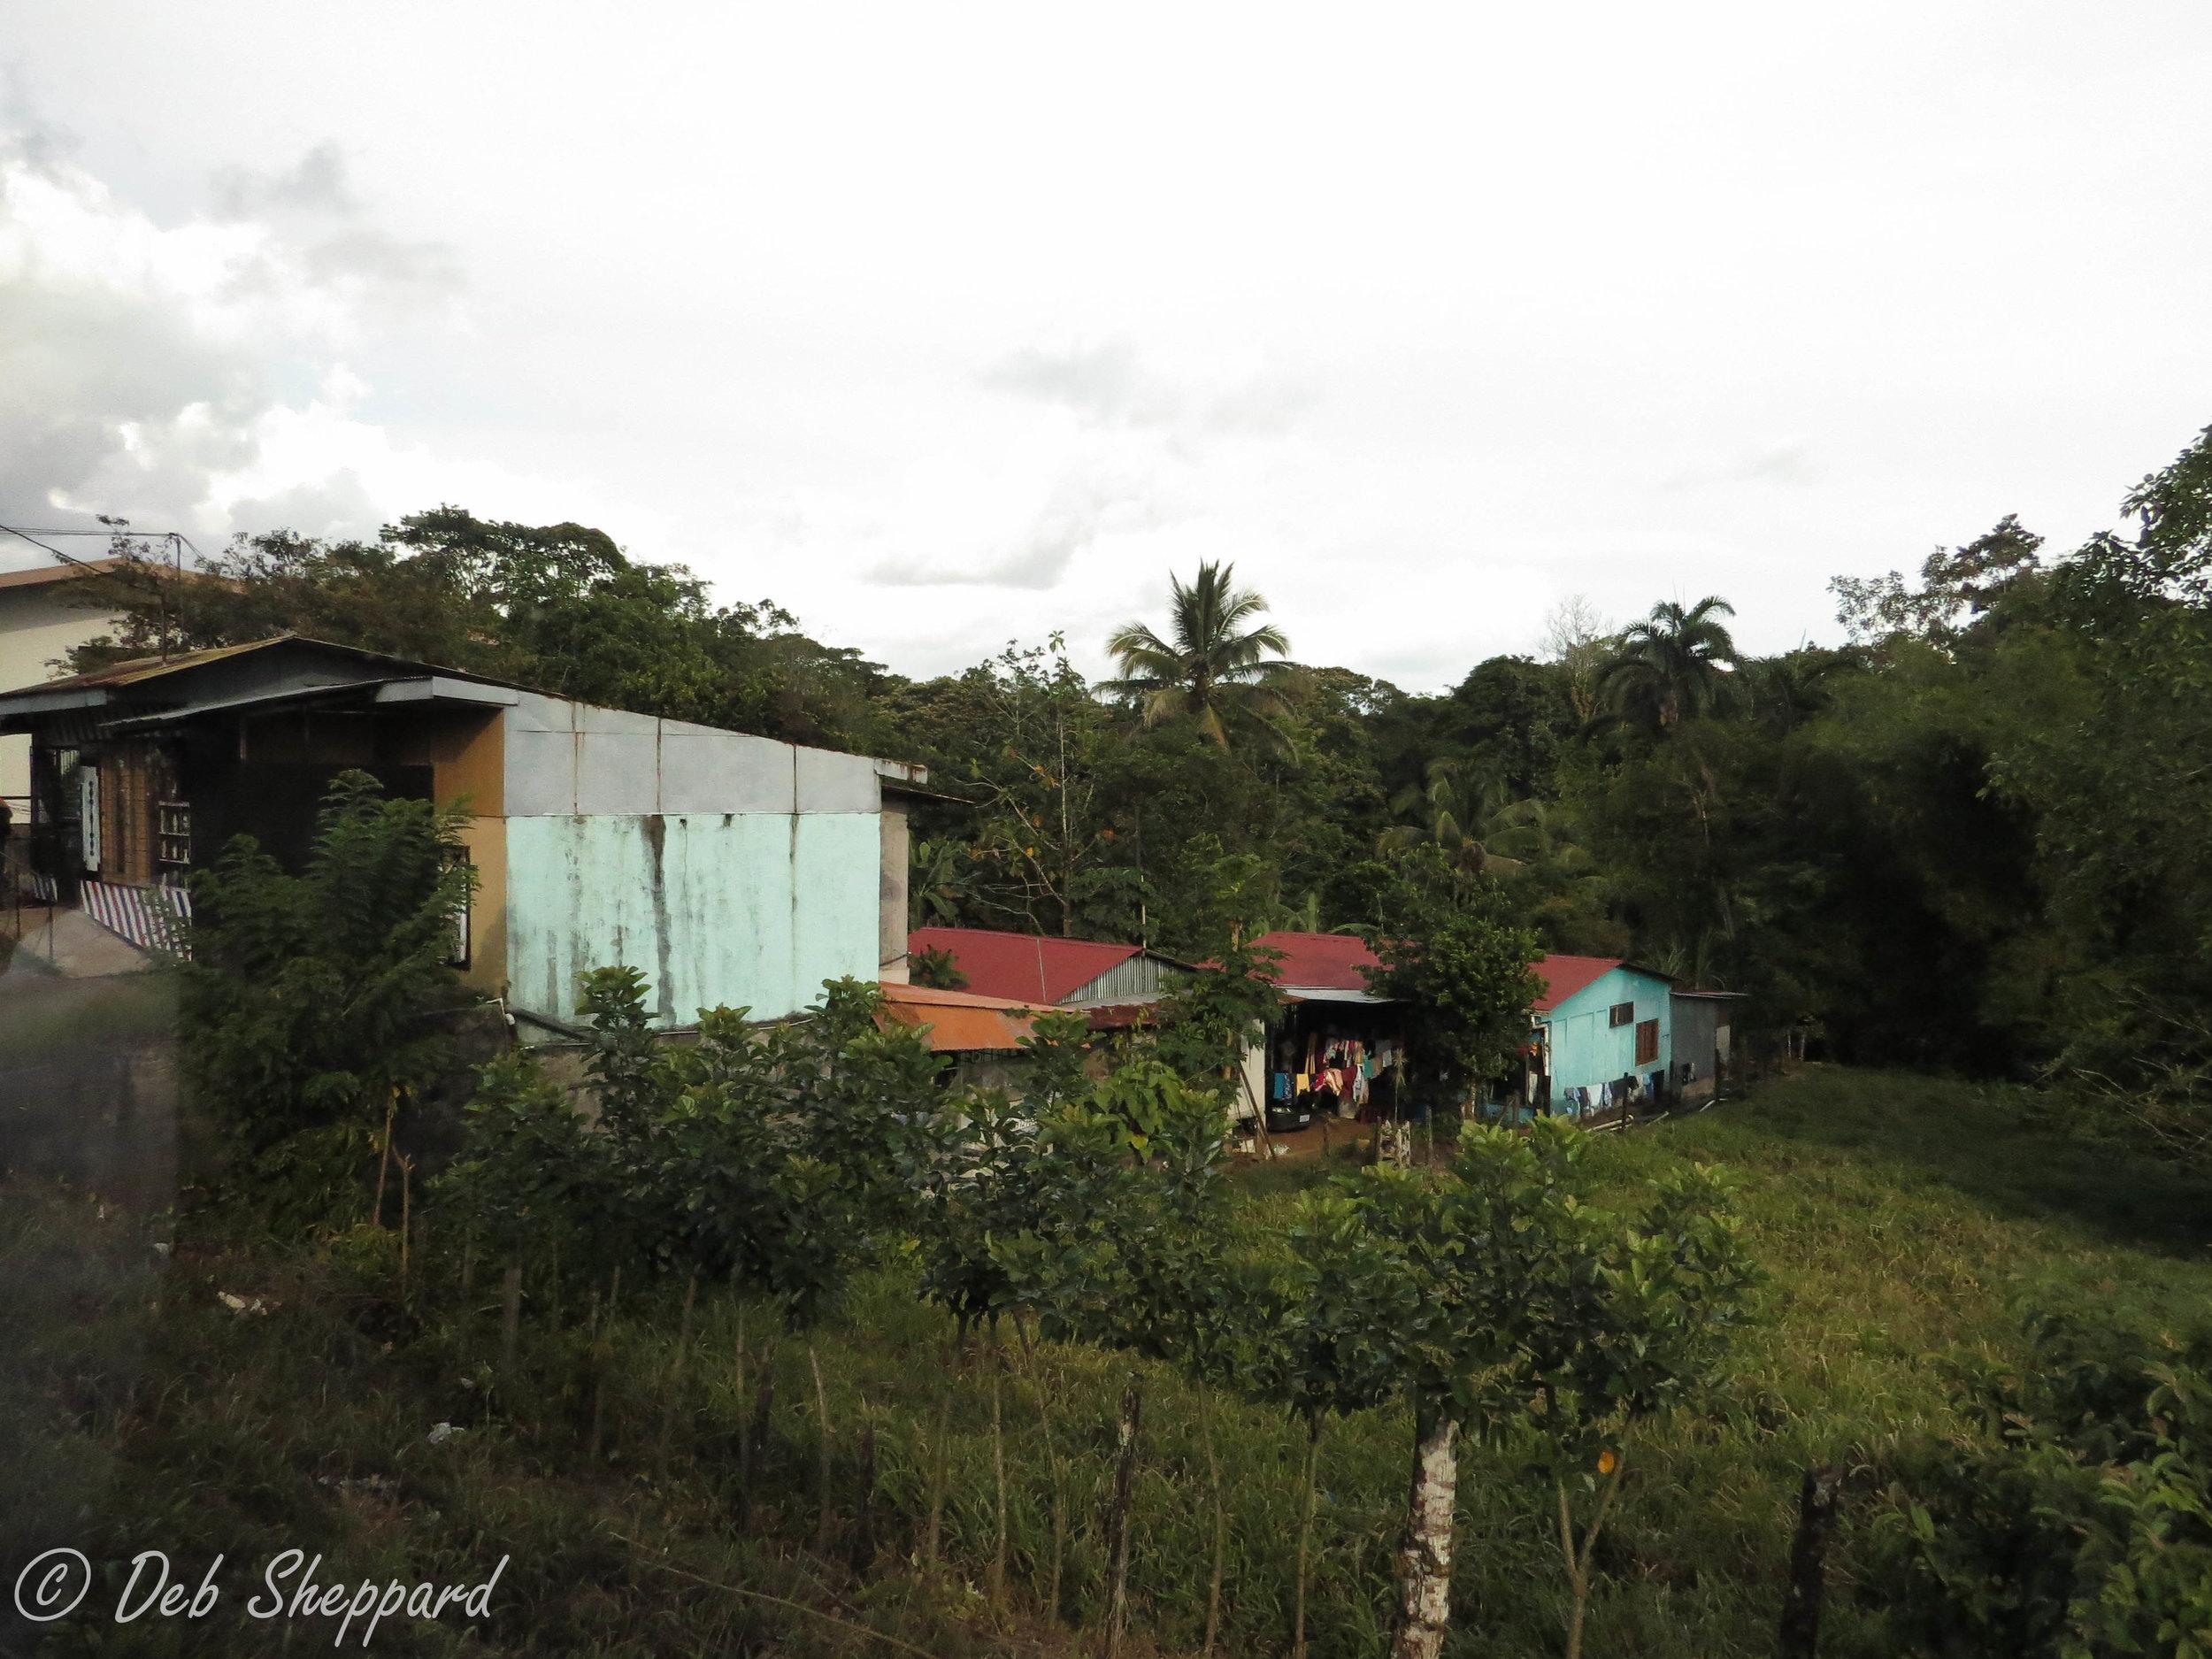 Costa Rica STM 2015 - Lisa Mai, CEC